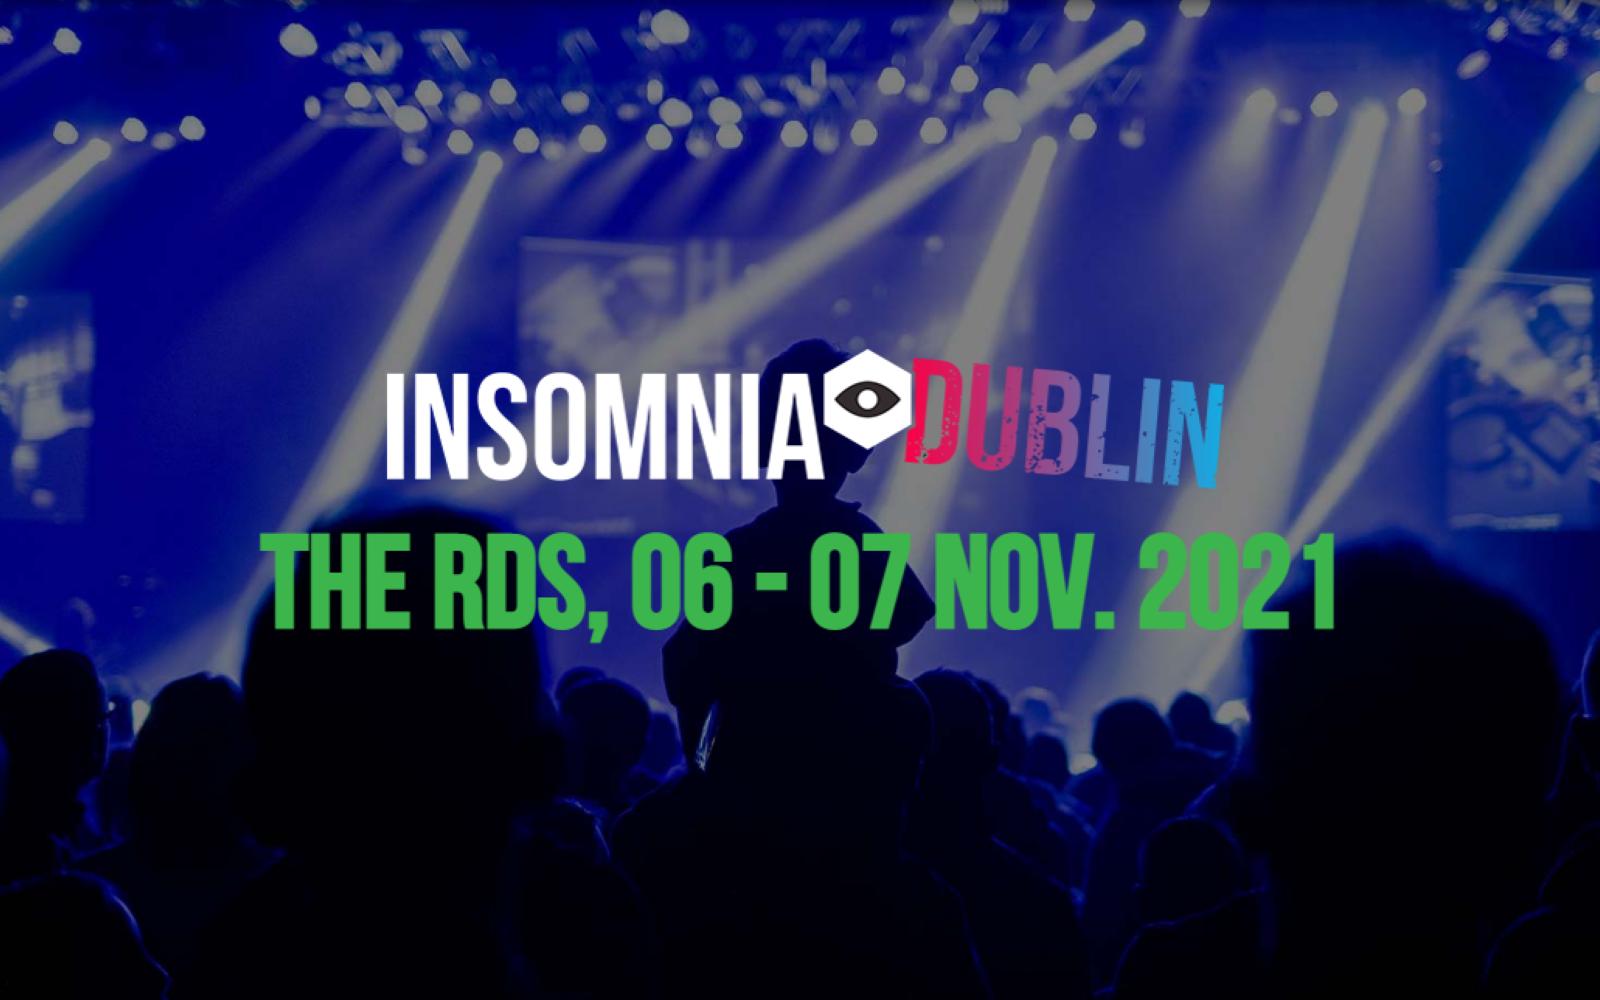 Insomnia Gaming Festival Dublin 2021 Set To Take Place In November